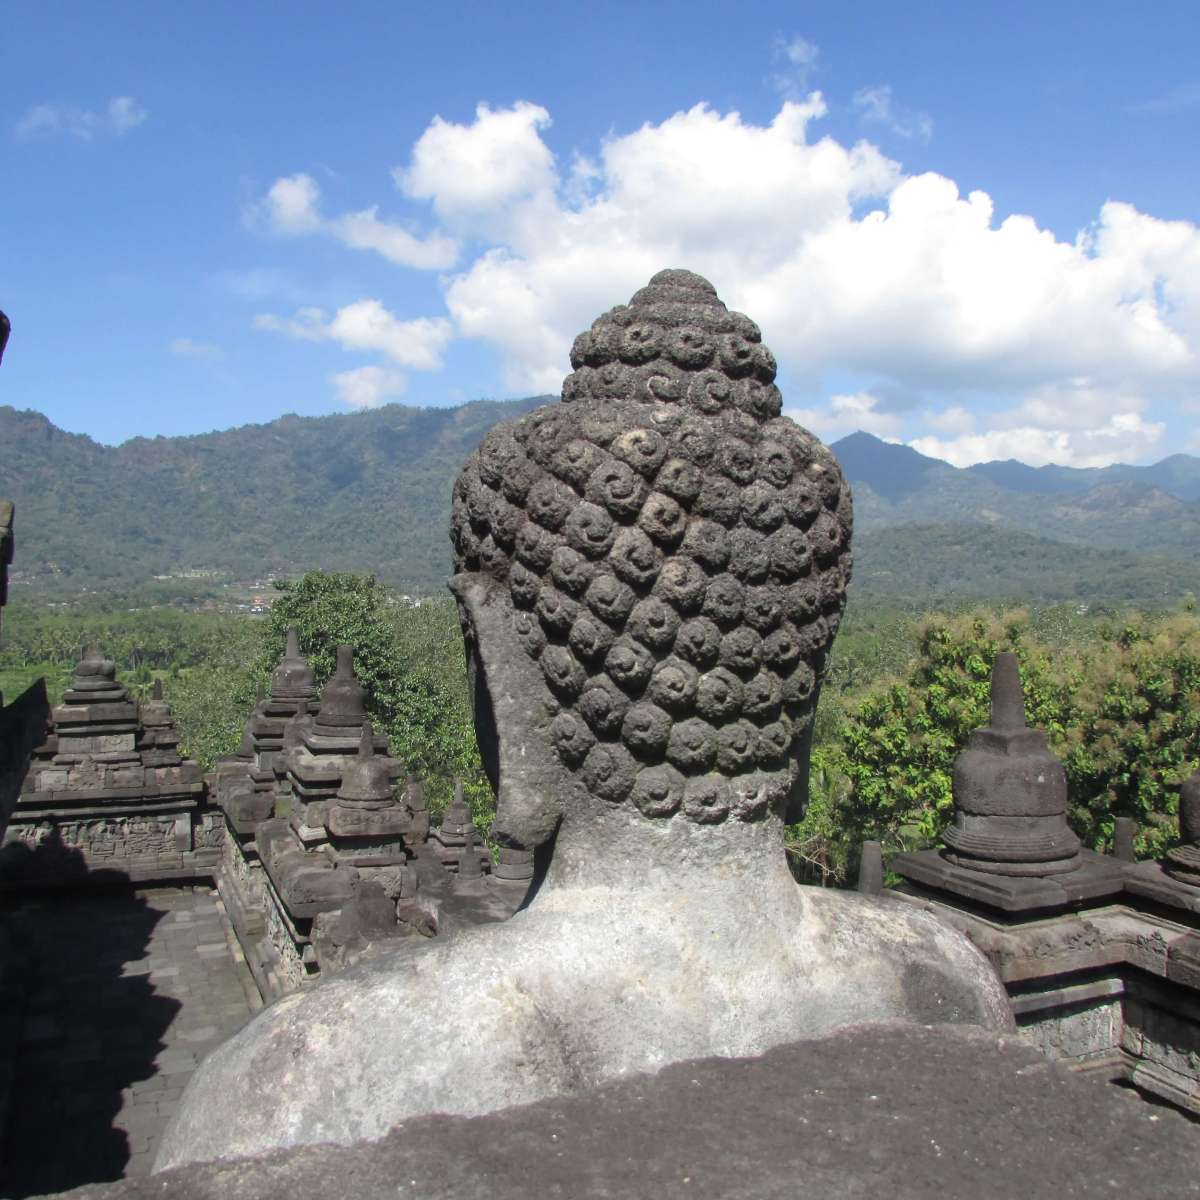 Tête de buddha, Borobodus, Indonésie